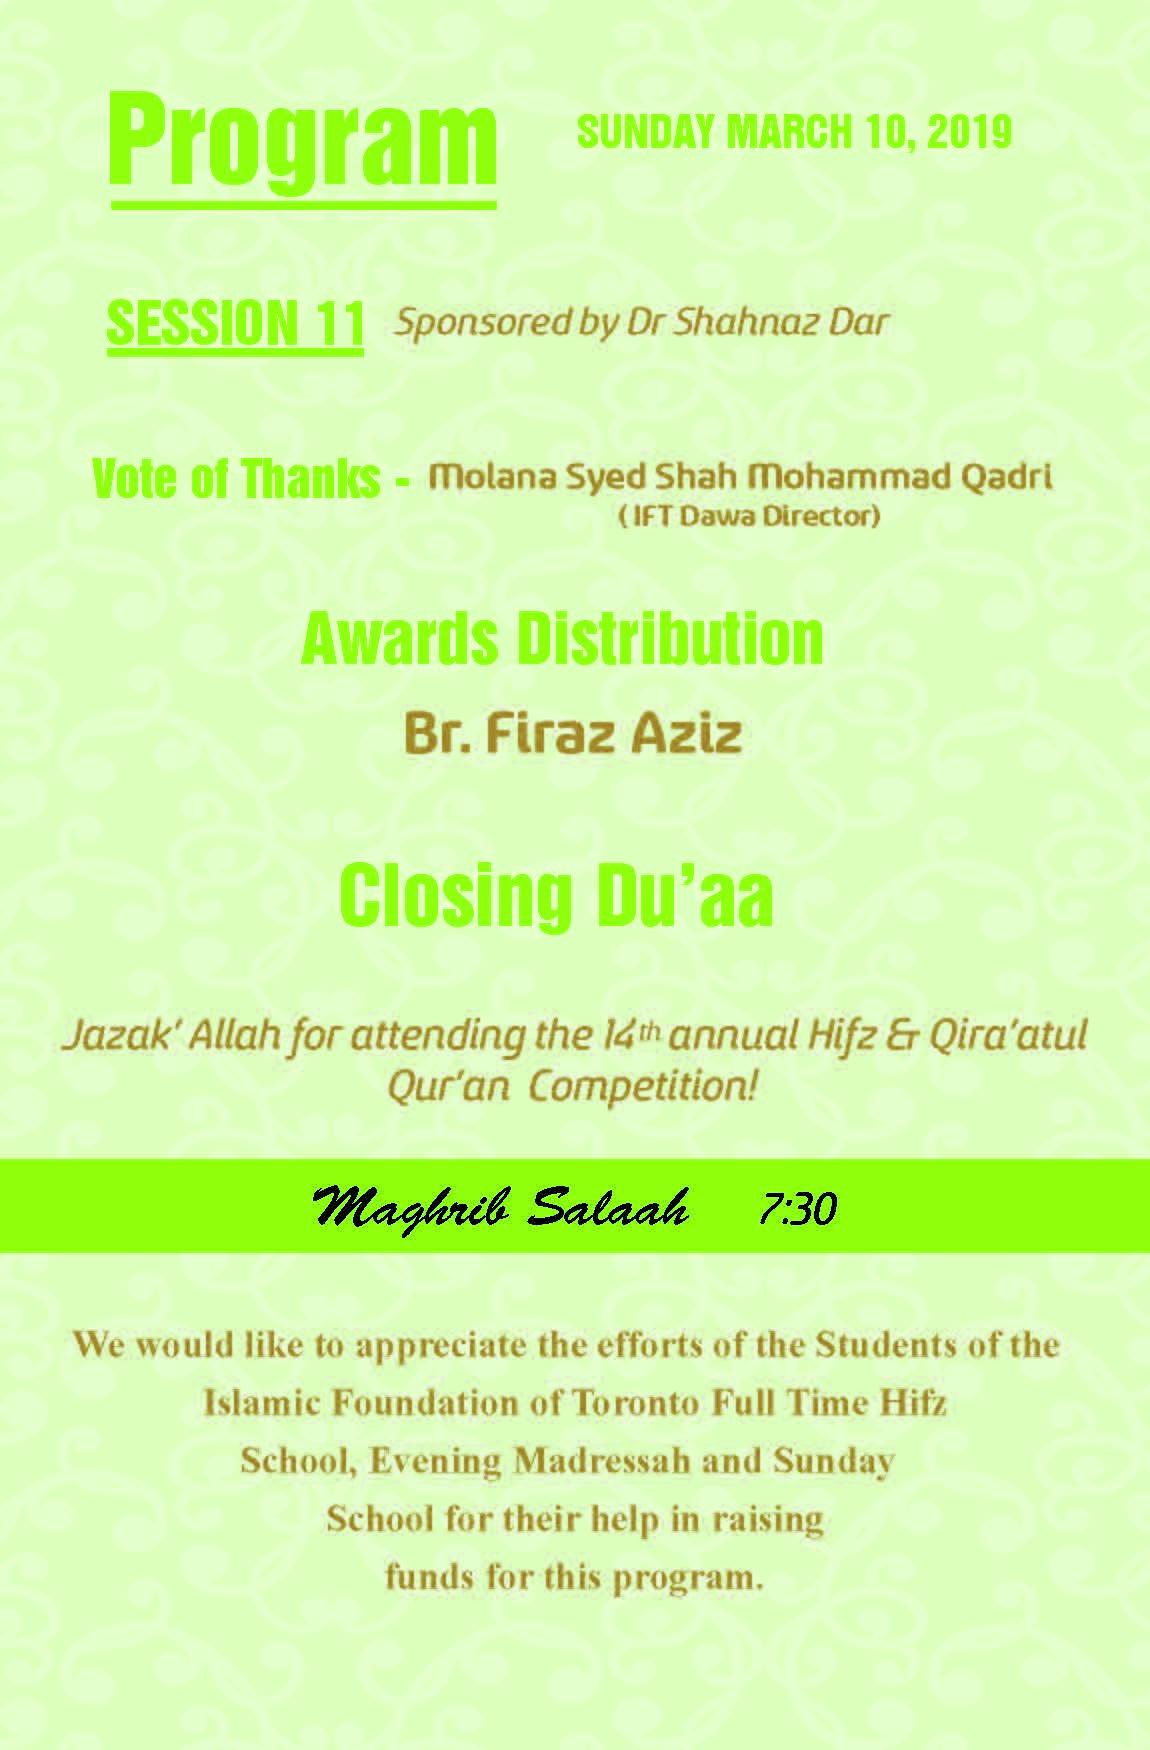 Qiraat Competition 2019 - Toronto, Canada - Islamic